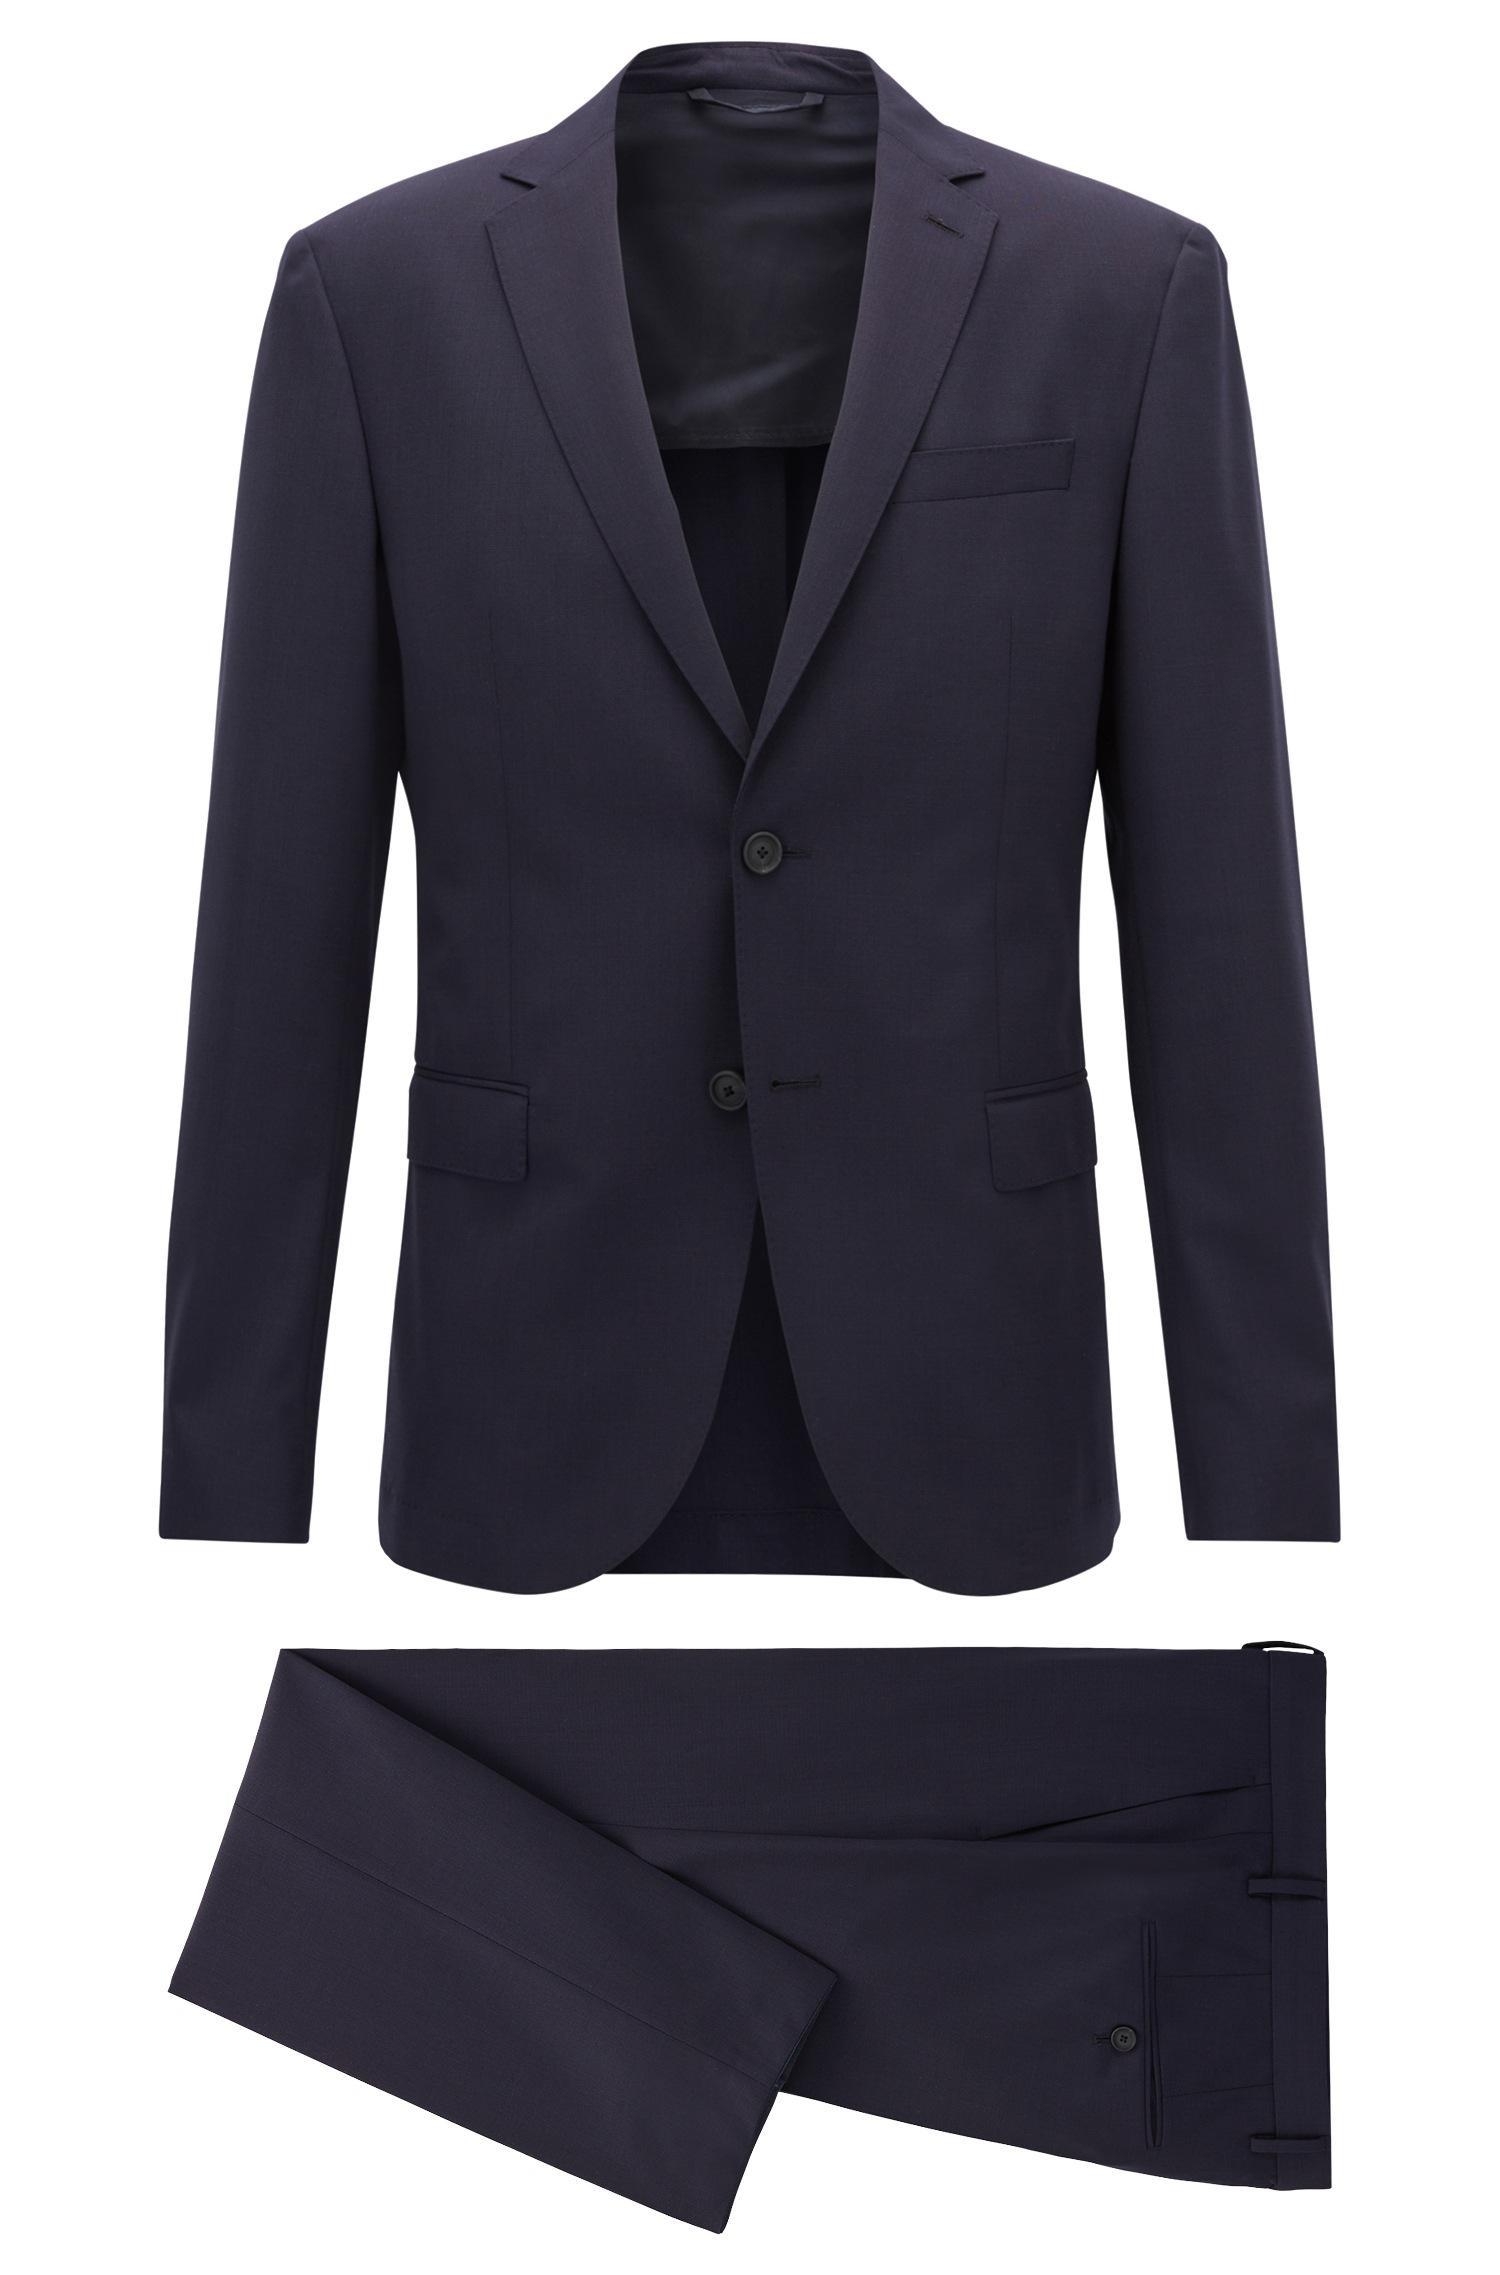 lyst boss slim fit suit in stretch virgin wool in blue for men. Black Bedroom Furniture Sets. Home Design Ideas